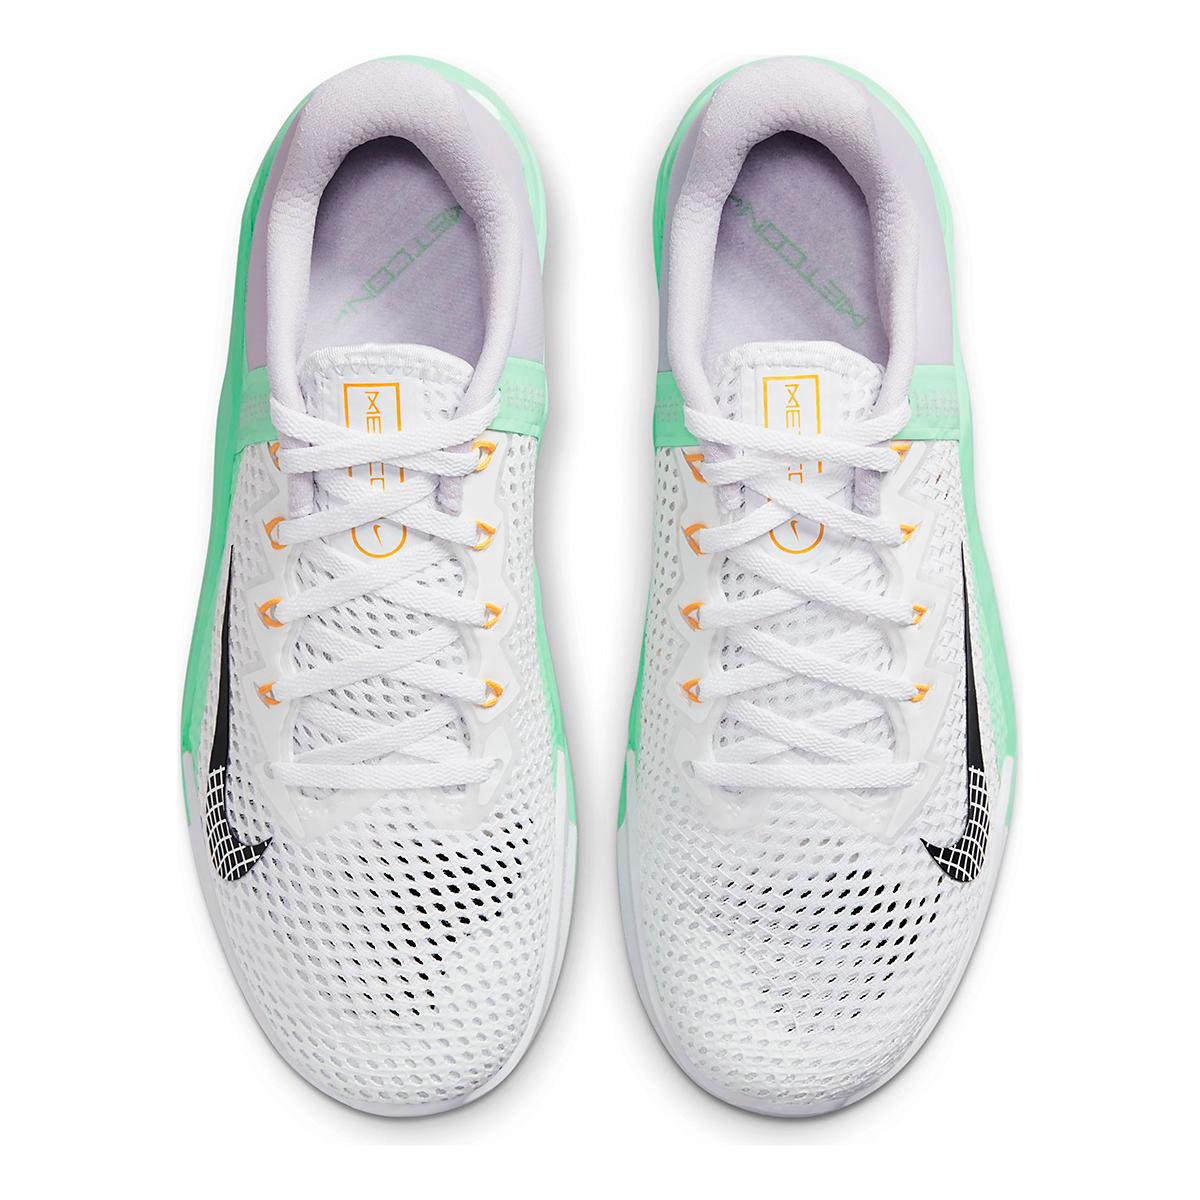 Women's Nike Metcon 6 Training Shoe - Color: White/Smoke Grey/Infinite Lilac - Size: 5 - Width: Regular, White/Smoke Grey/Infinite Lilac, large, image 6